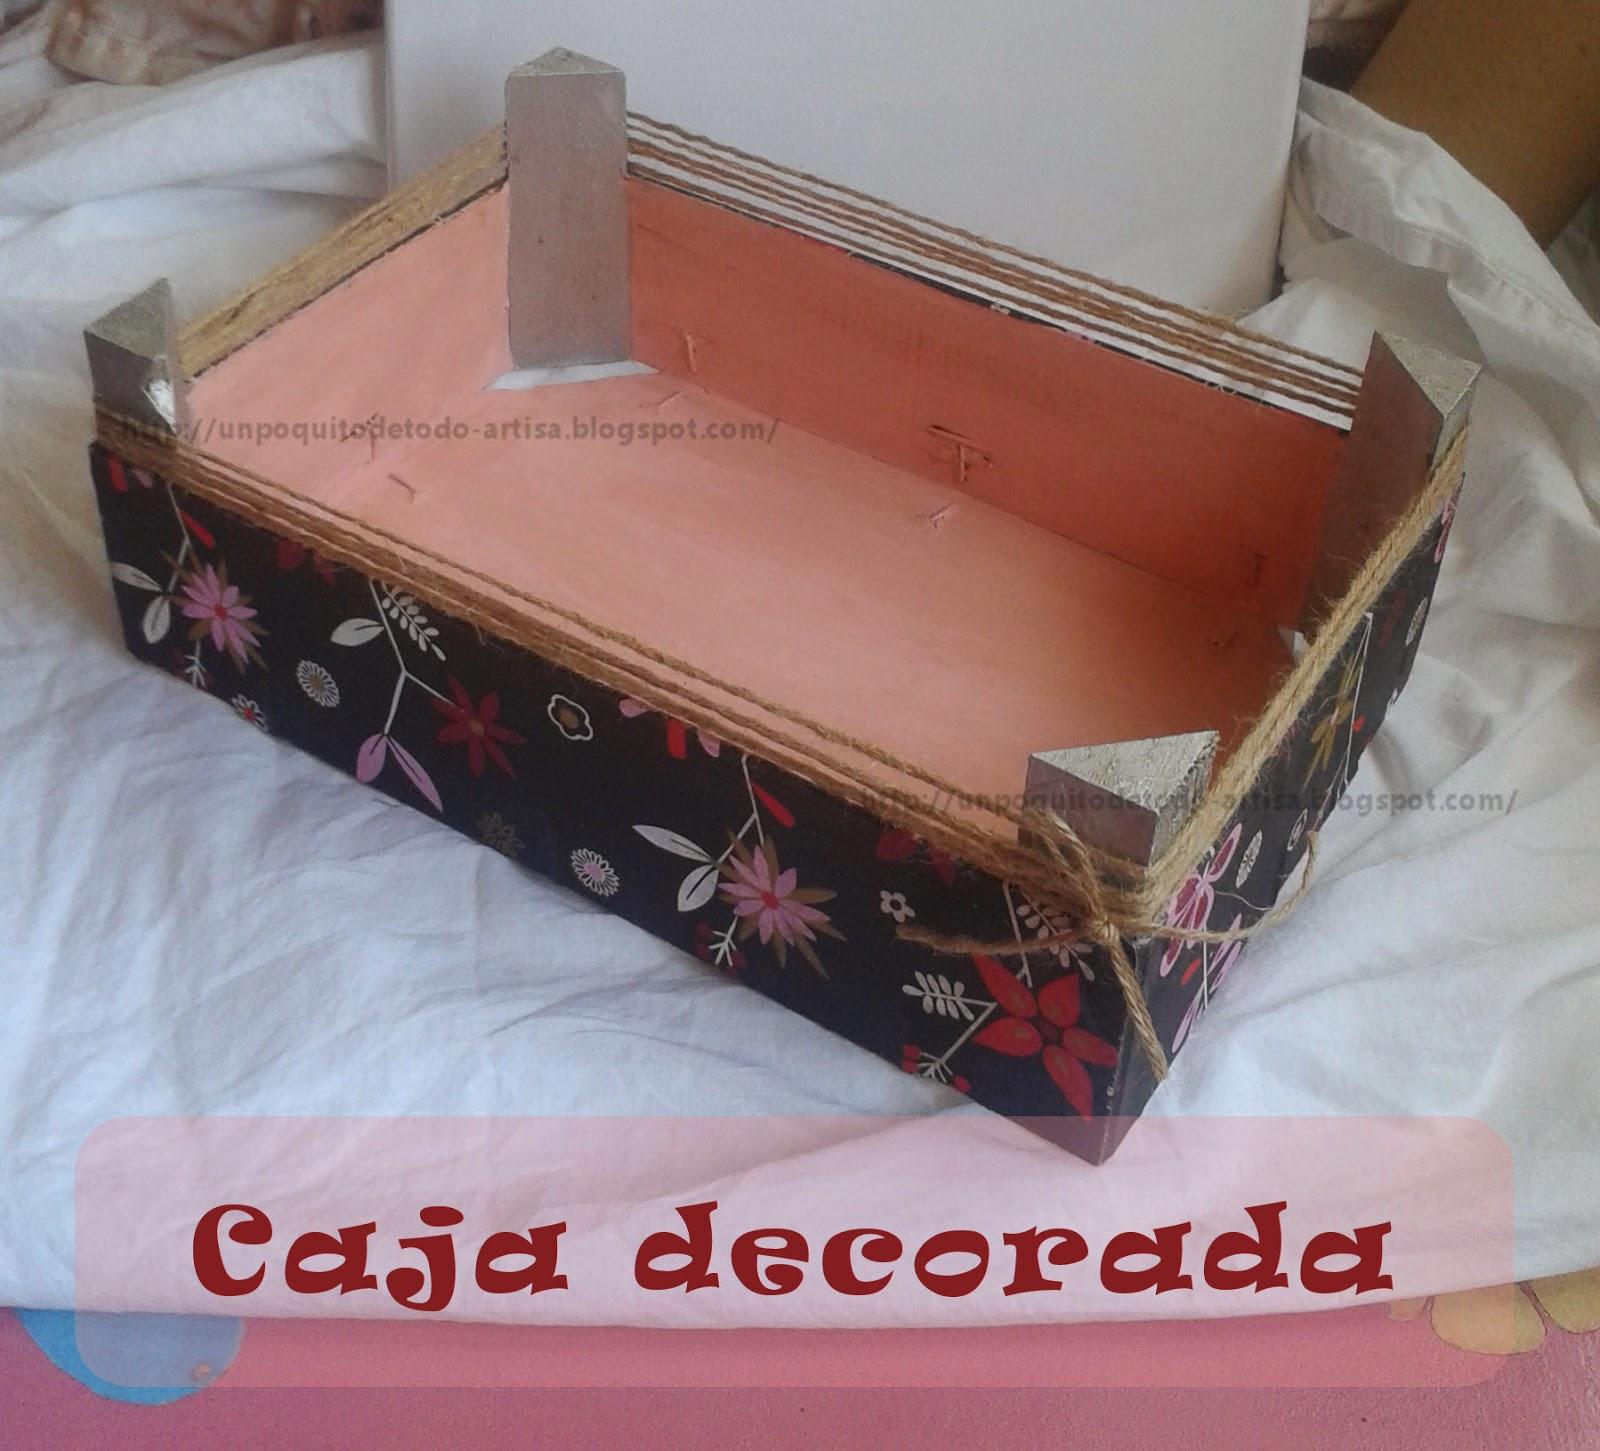 Un poquito de todo cajas decoradas - Cajas de fresas decoradas paso a paso ...